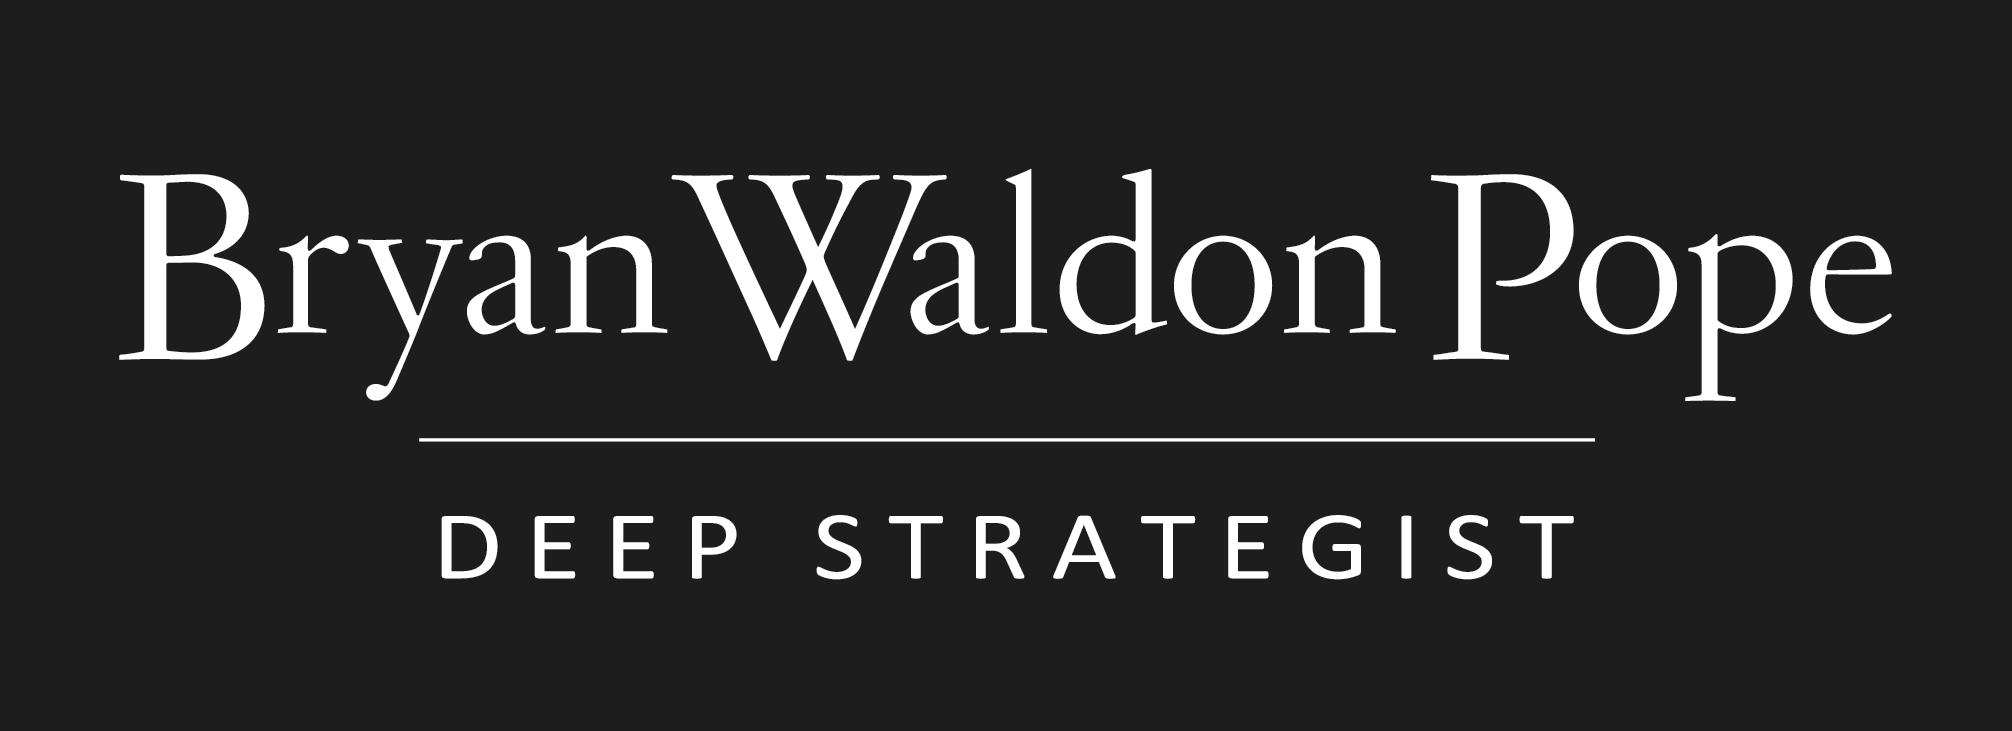 Bryan Waldon Pope | Deep Strategist